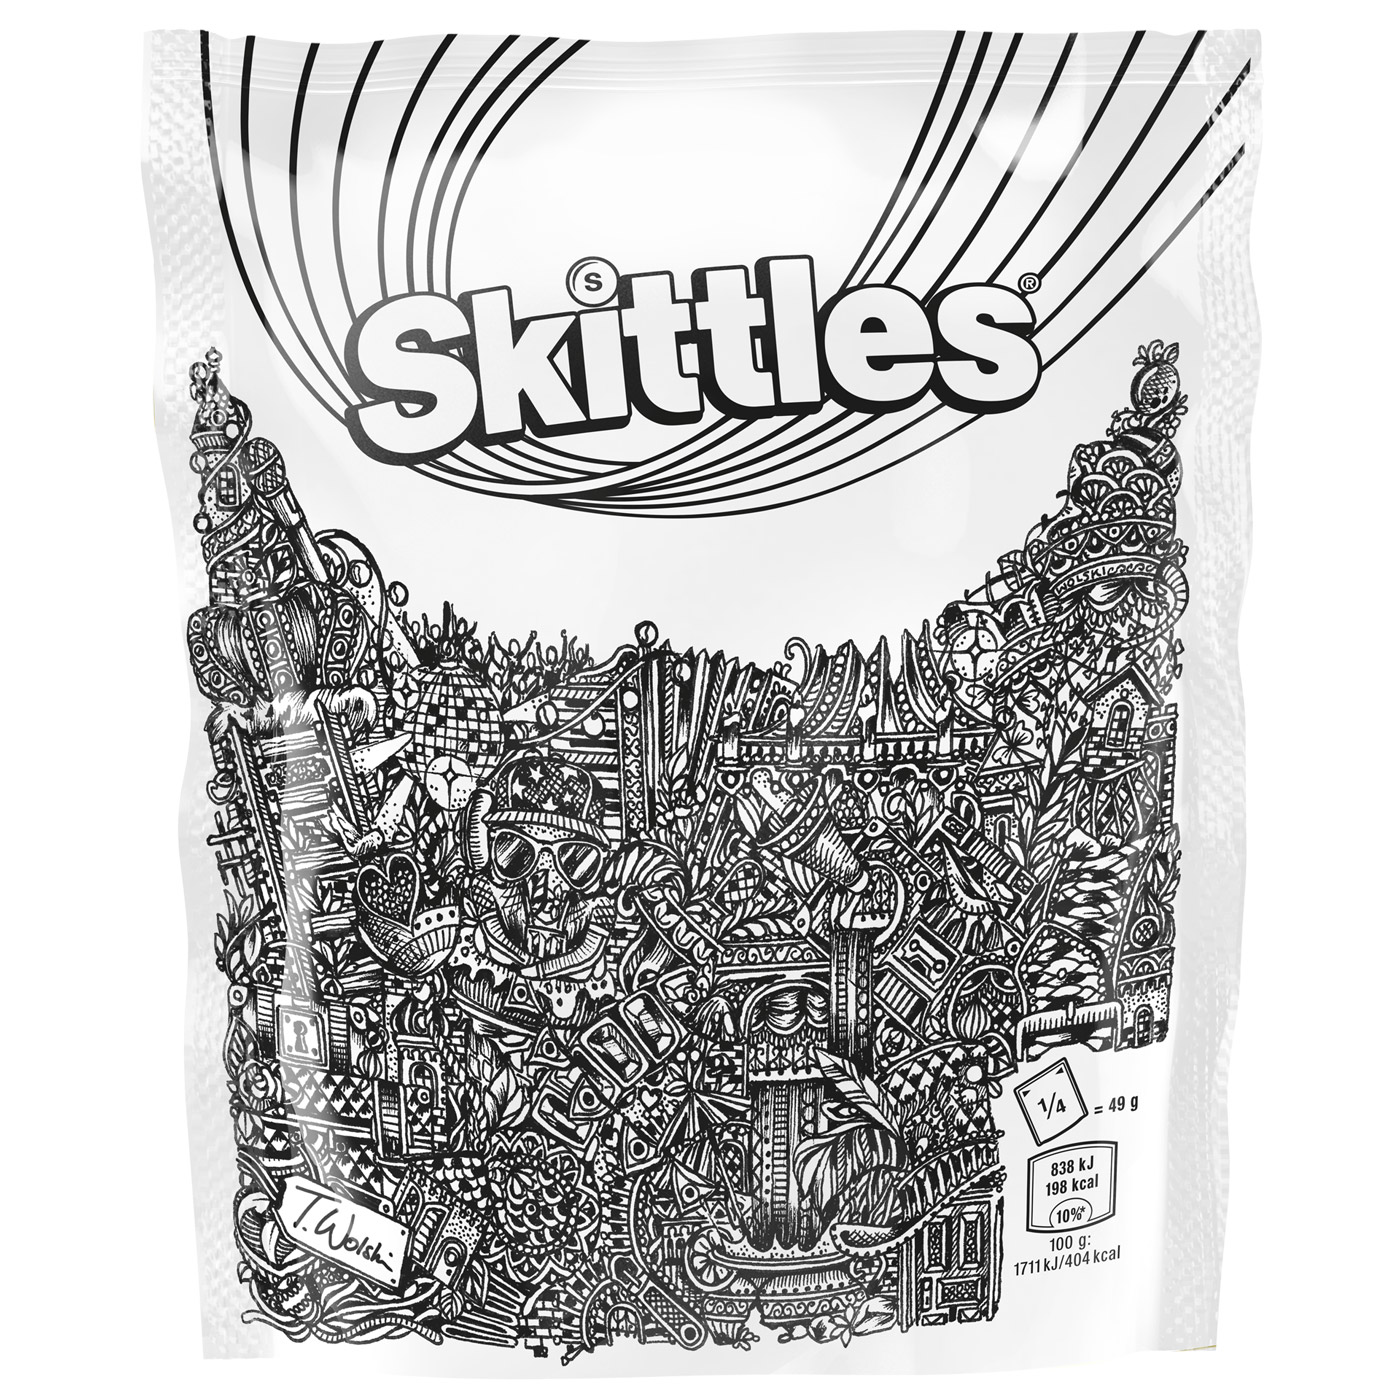 Skittles_Pride2019_Thom_Wolski.jpg